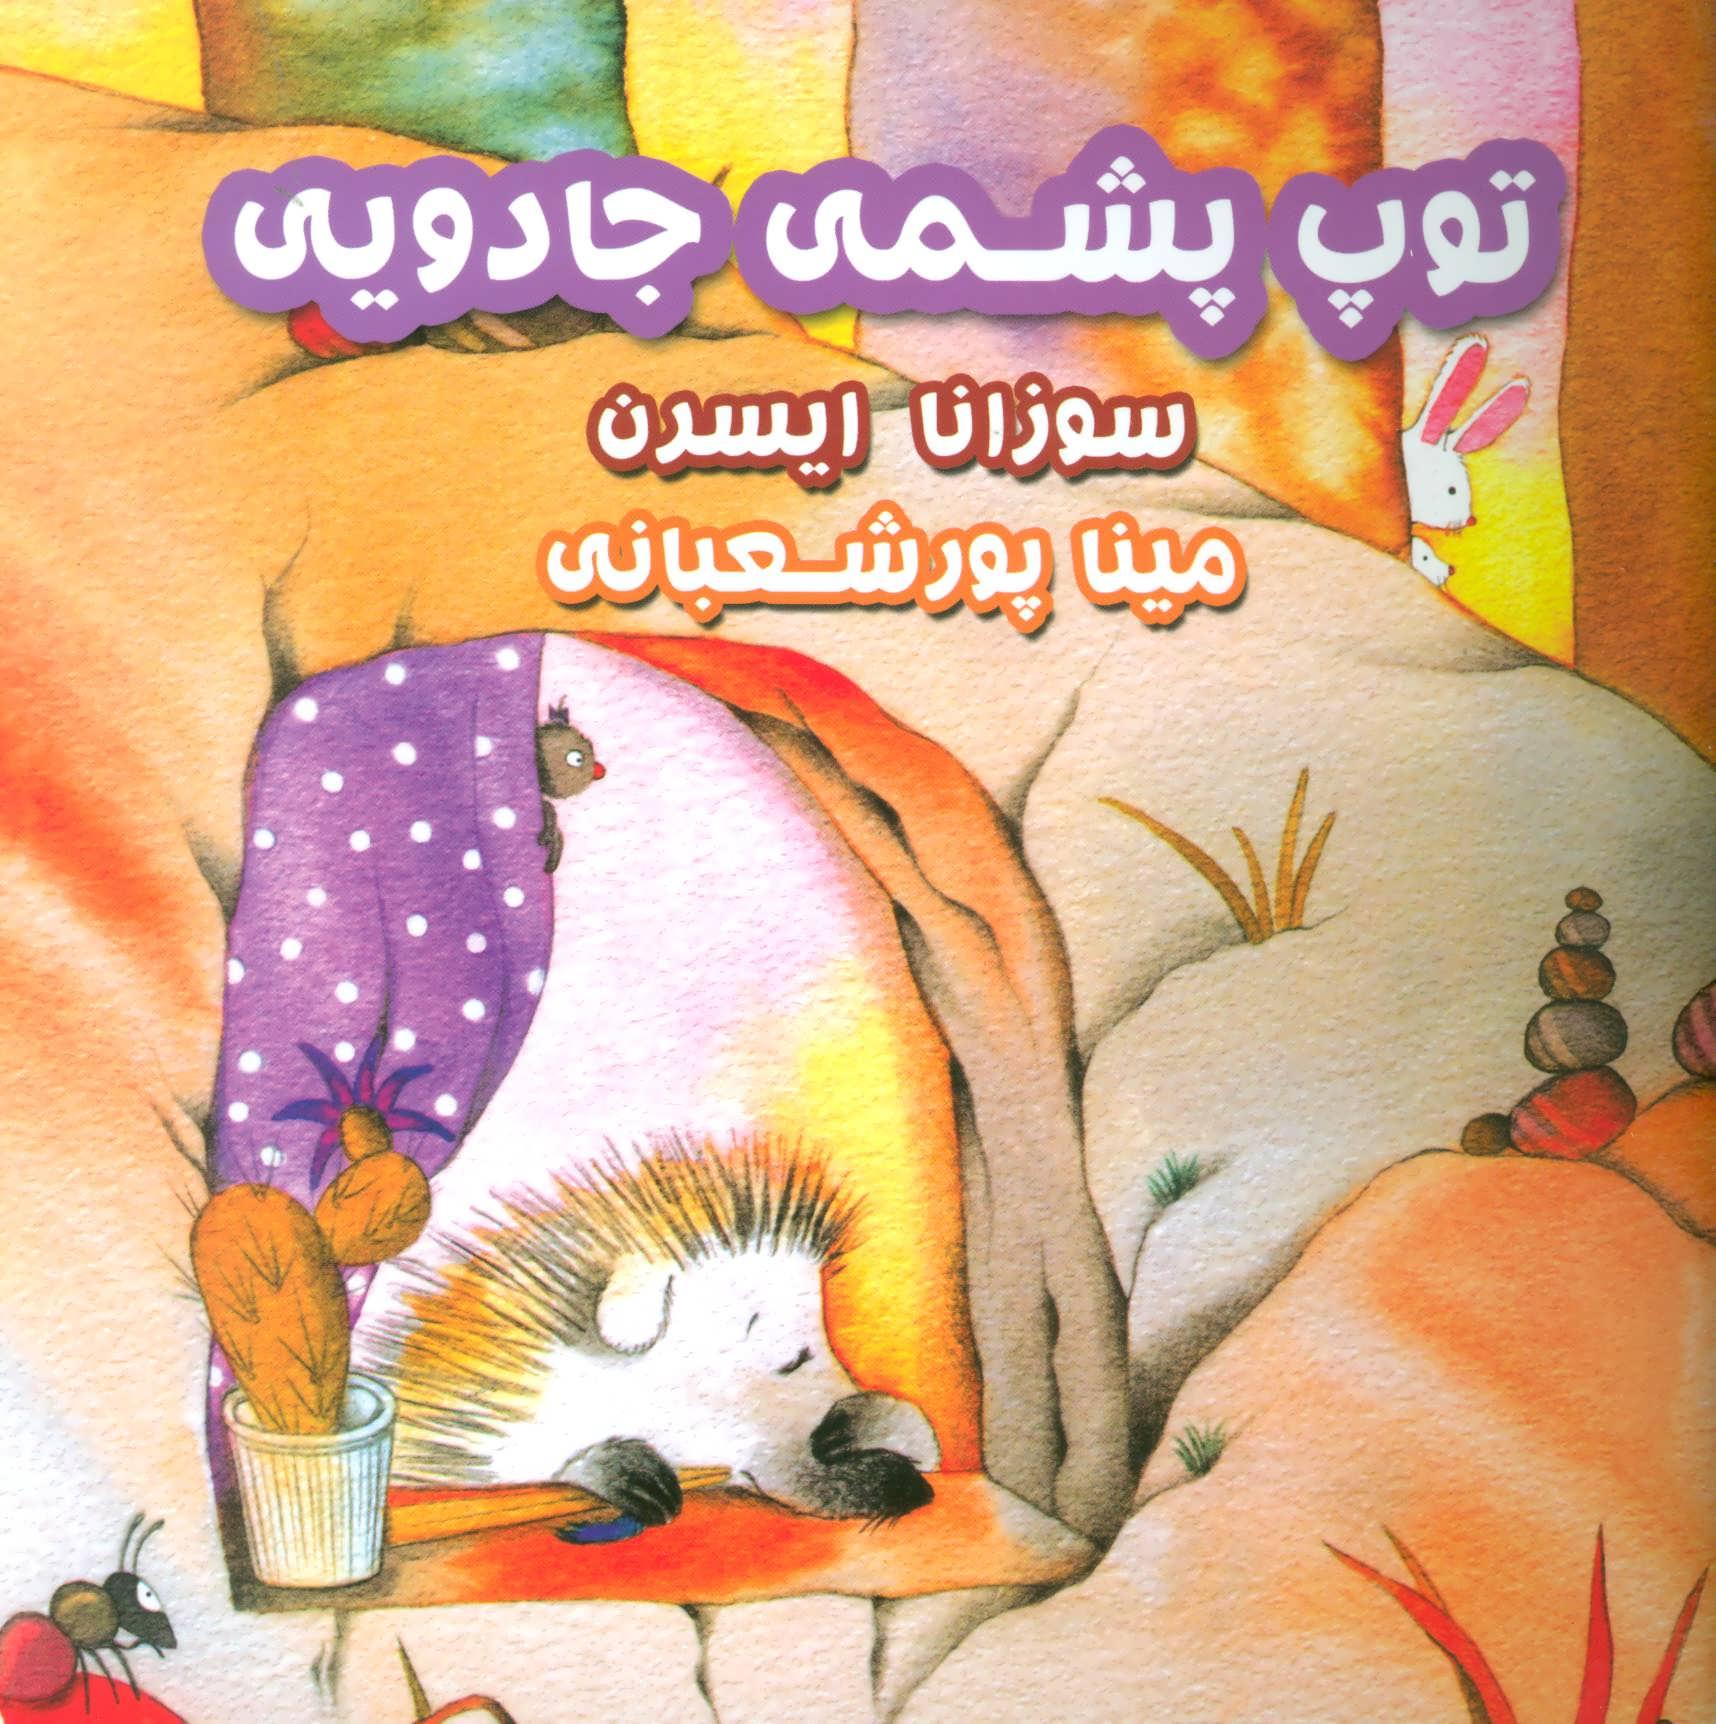 کتاب توپ پشمی جادویی